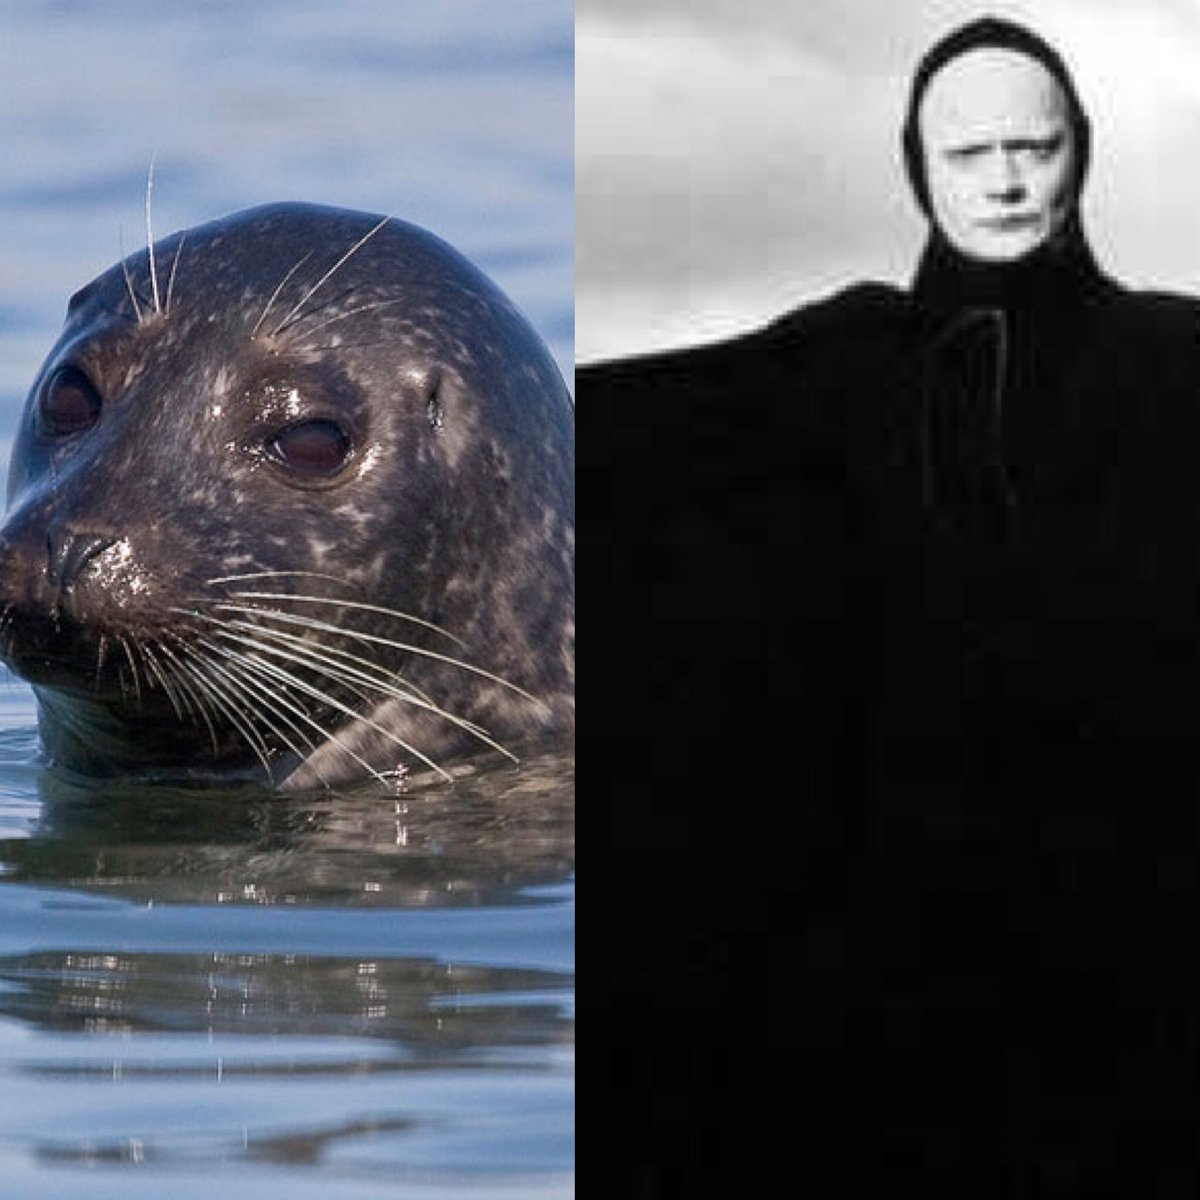 The Seventh Grey Seal #EltonJohnAShowOrMovie